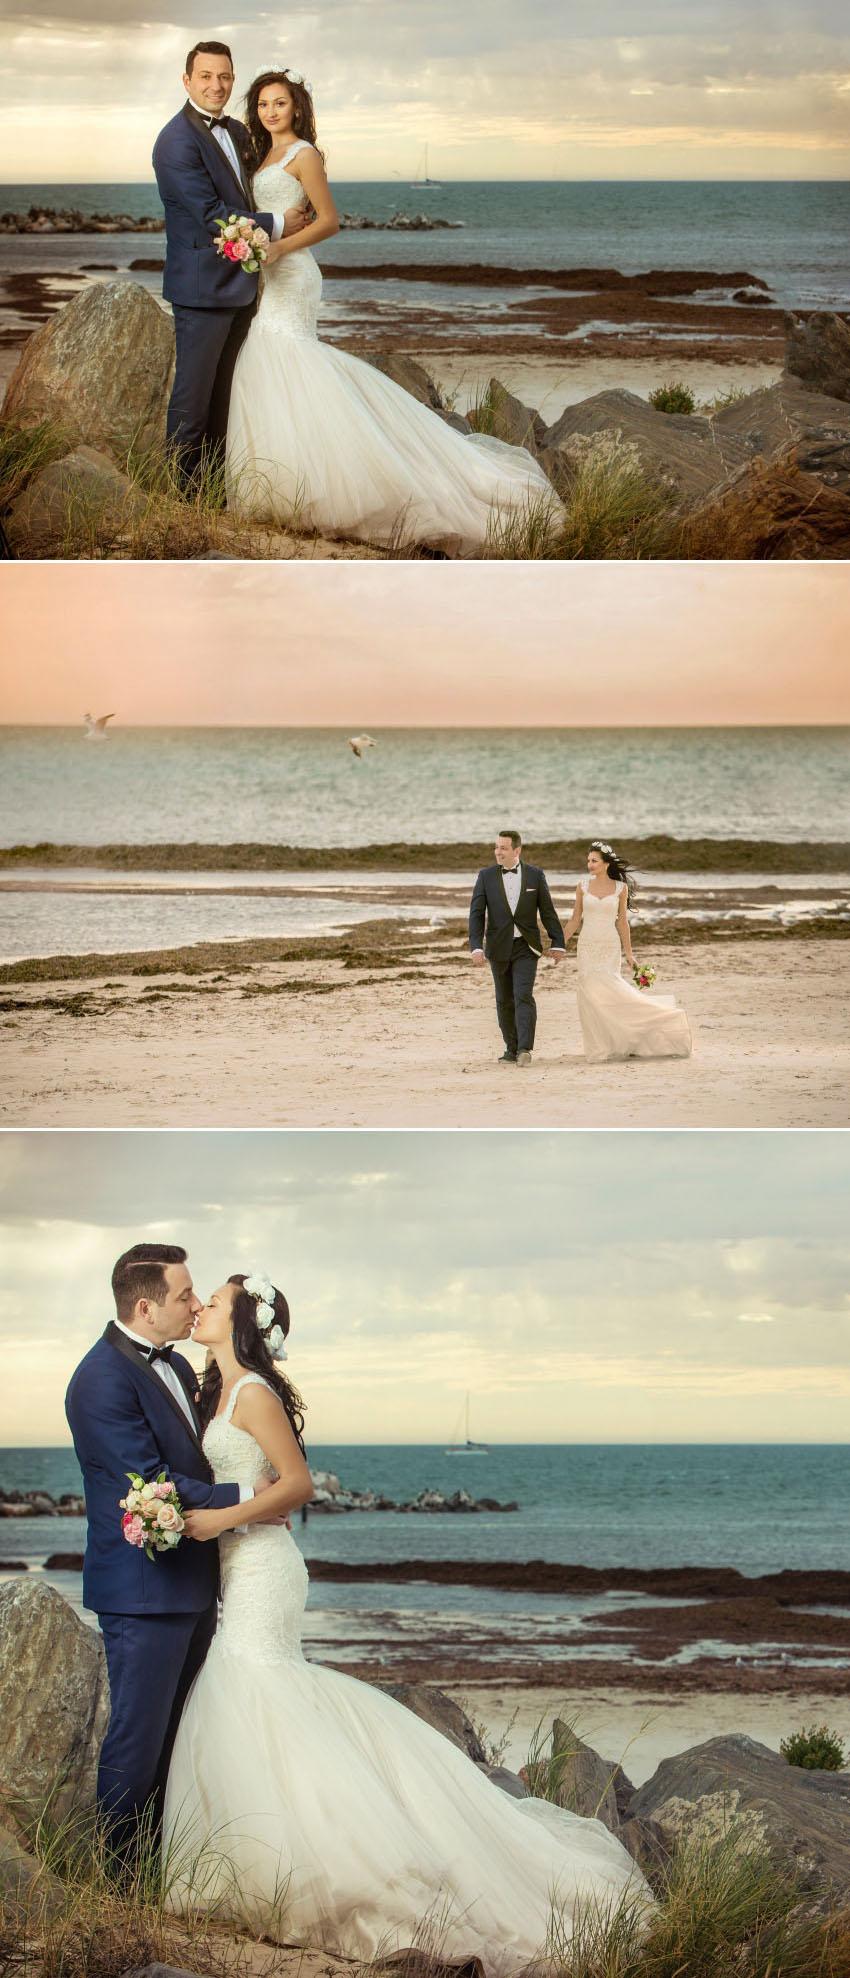 43_Destination wedding photography